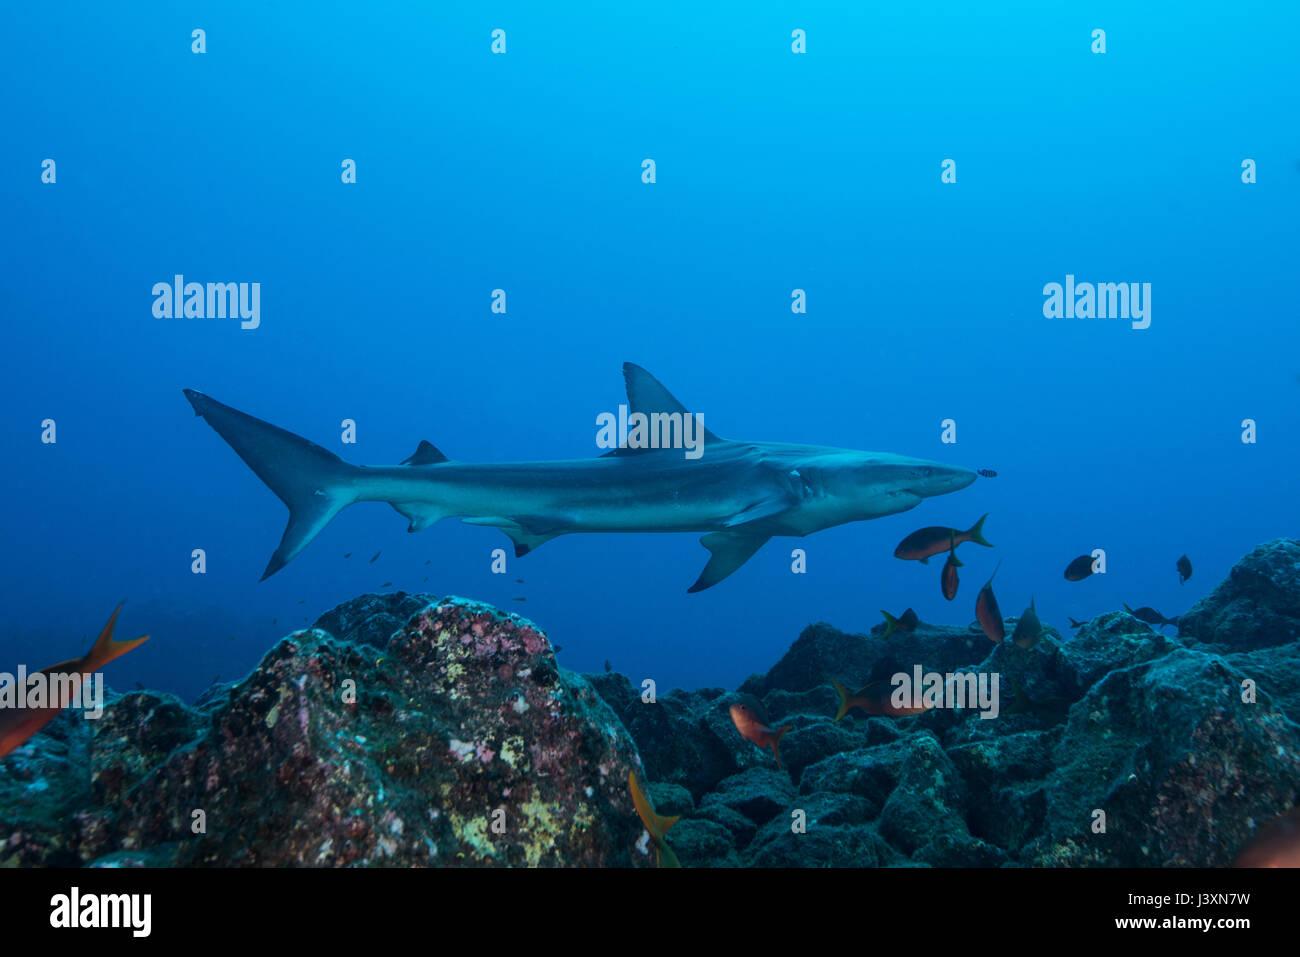 Rare sighting of a sick Blacktip Shark (Carcharhinus limbatus), San Benedicto, Colima, Mexico - Stock Image